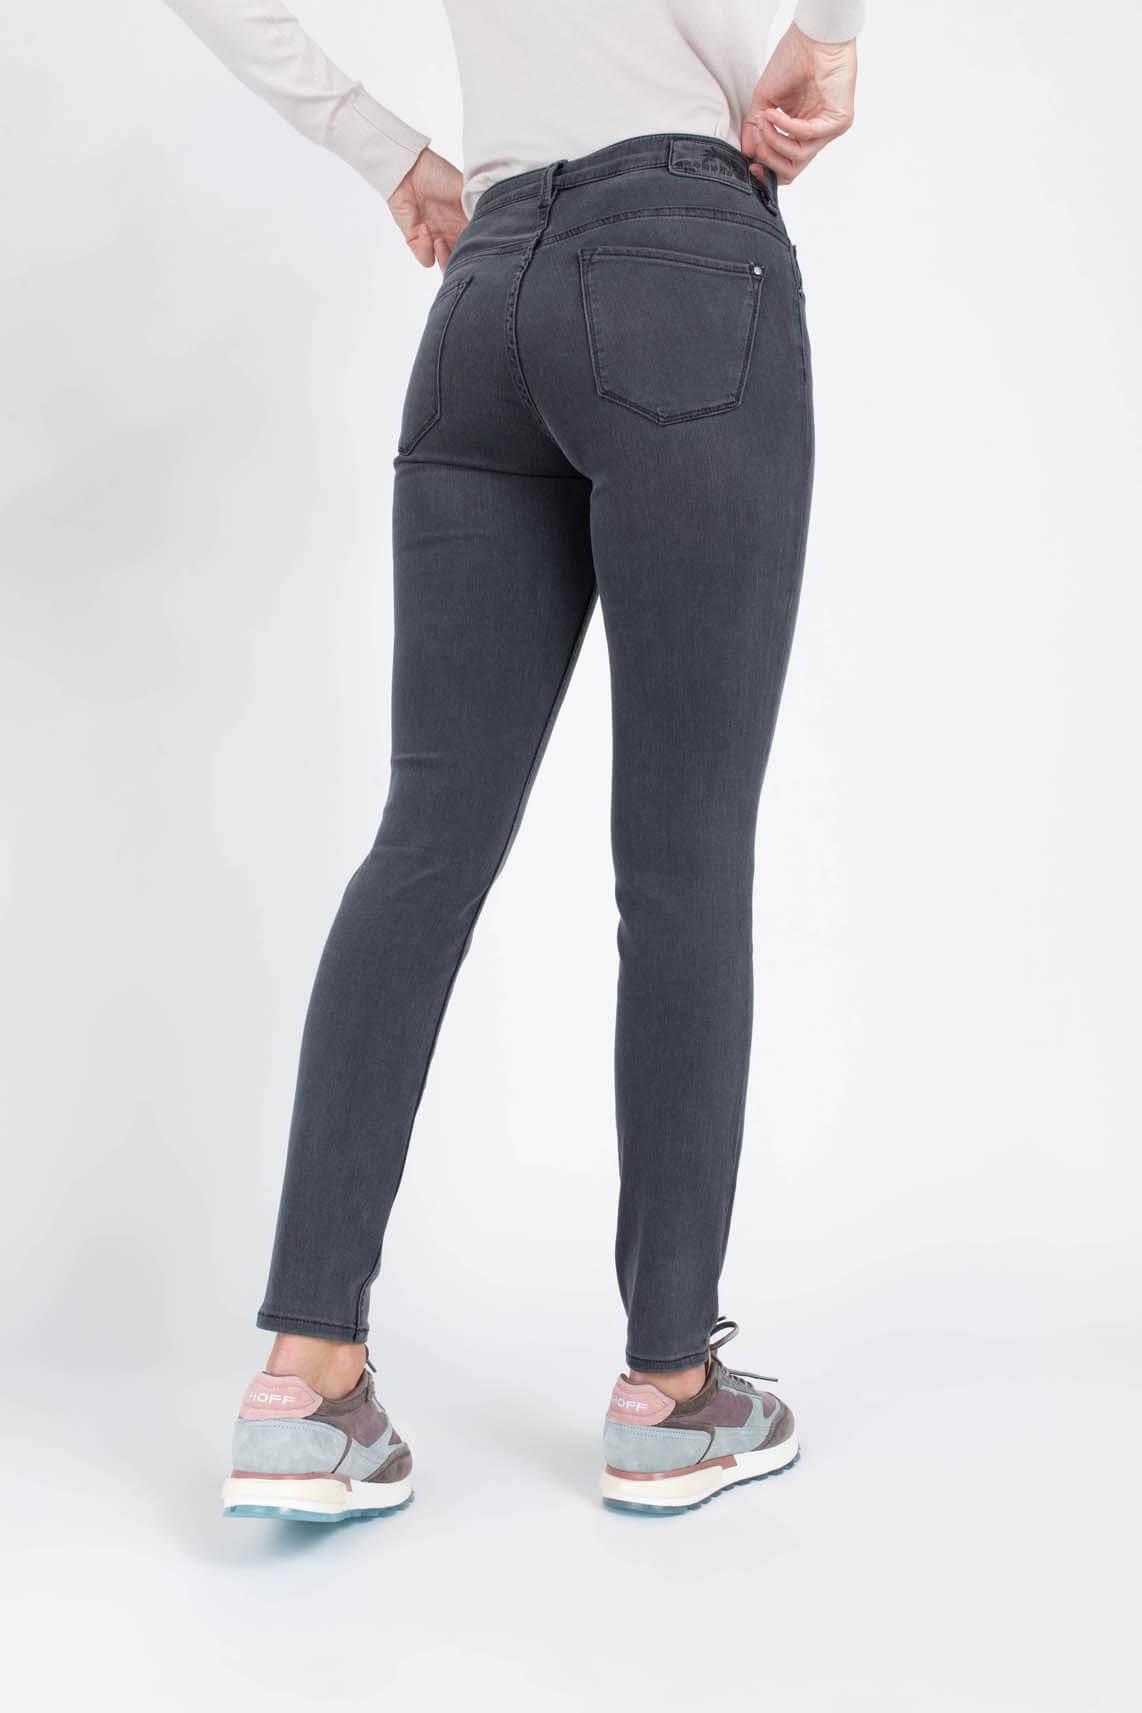 Rosner Dames L32 Antonia jeans Grijs